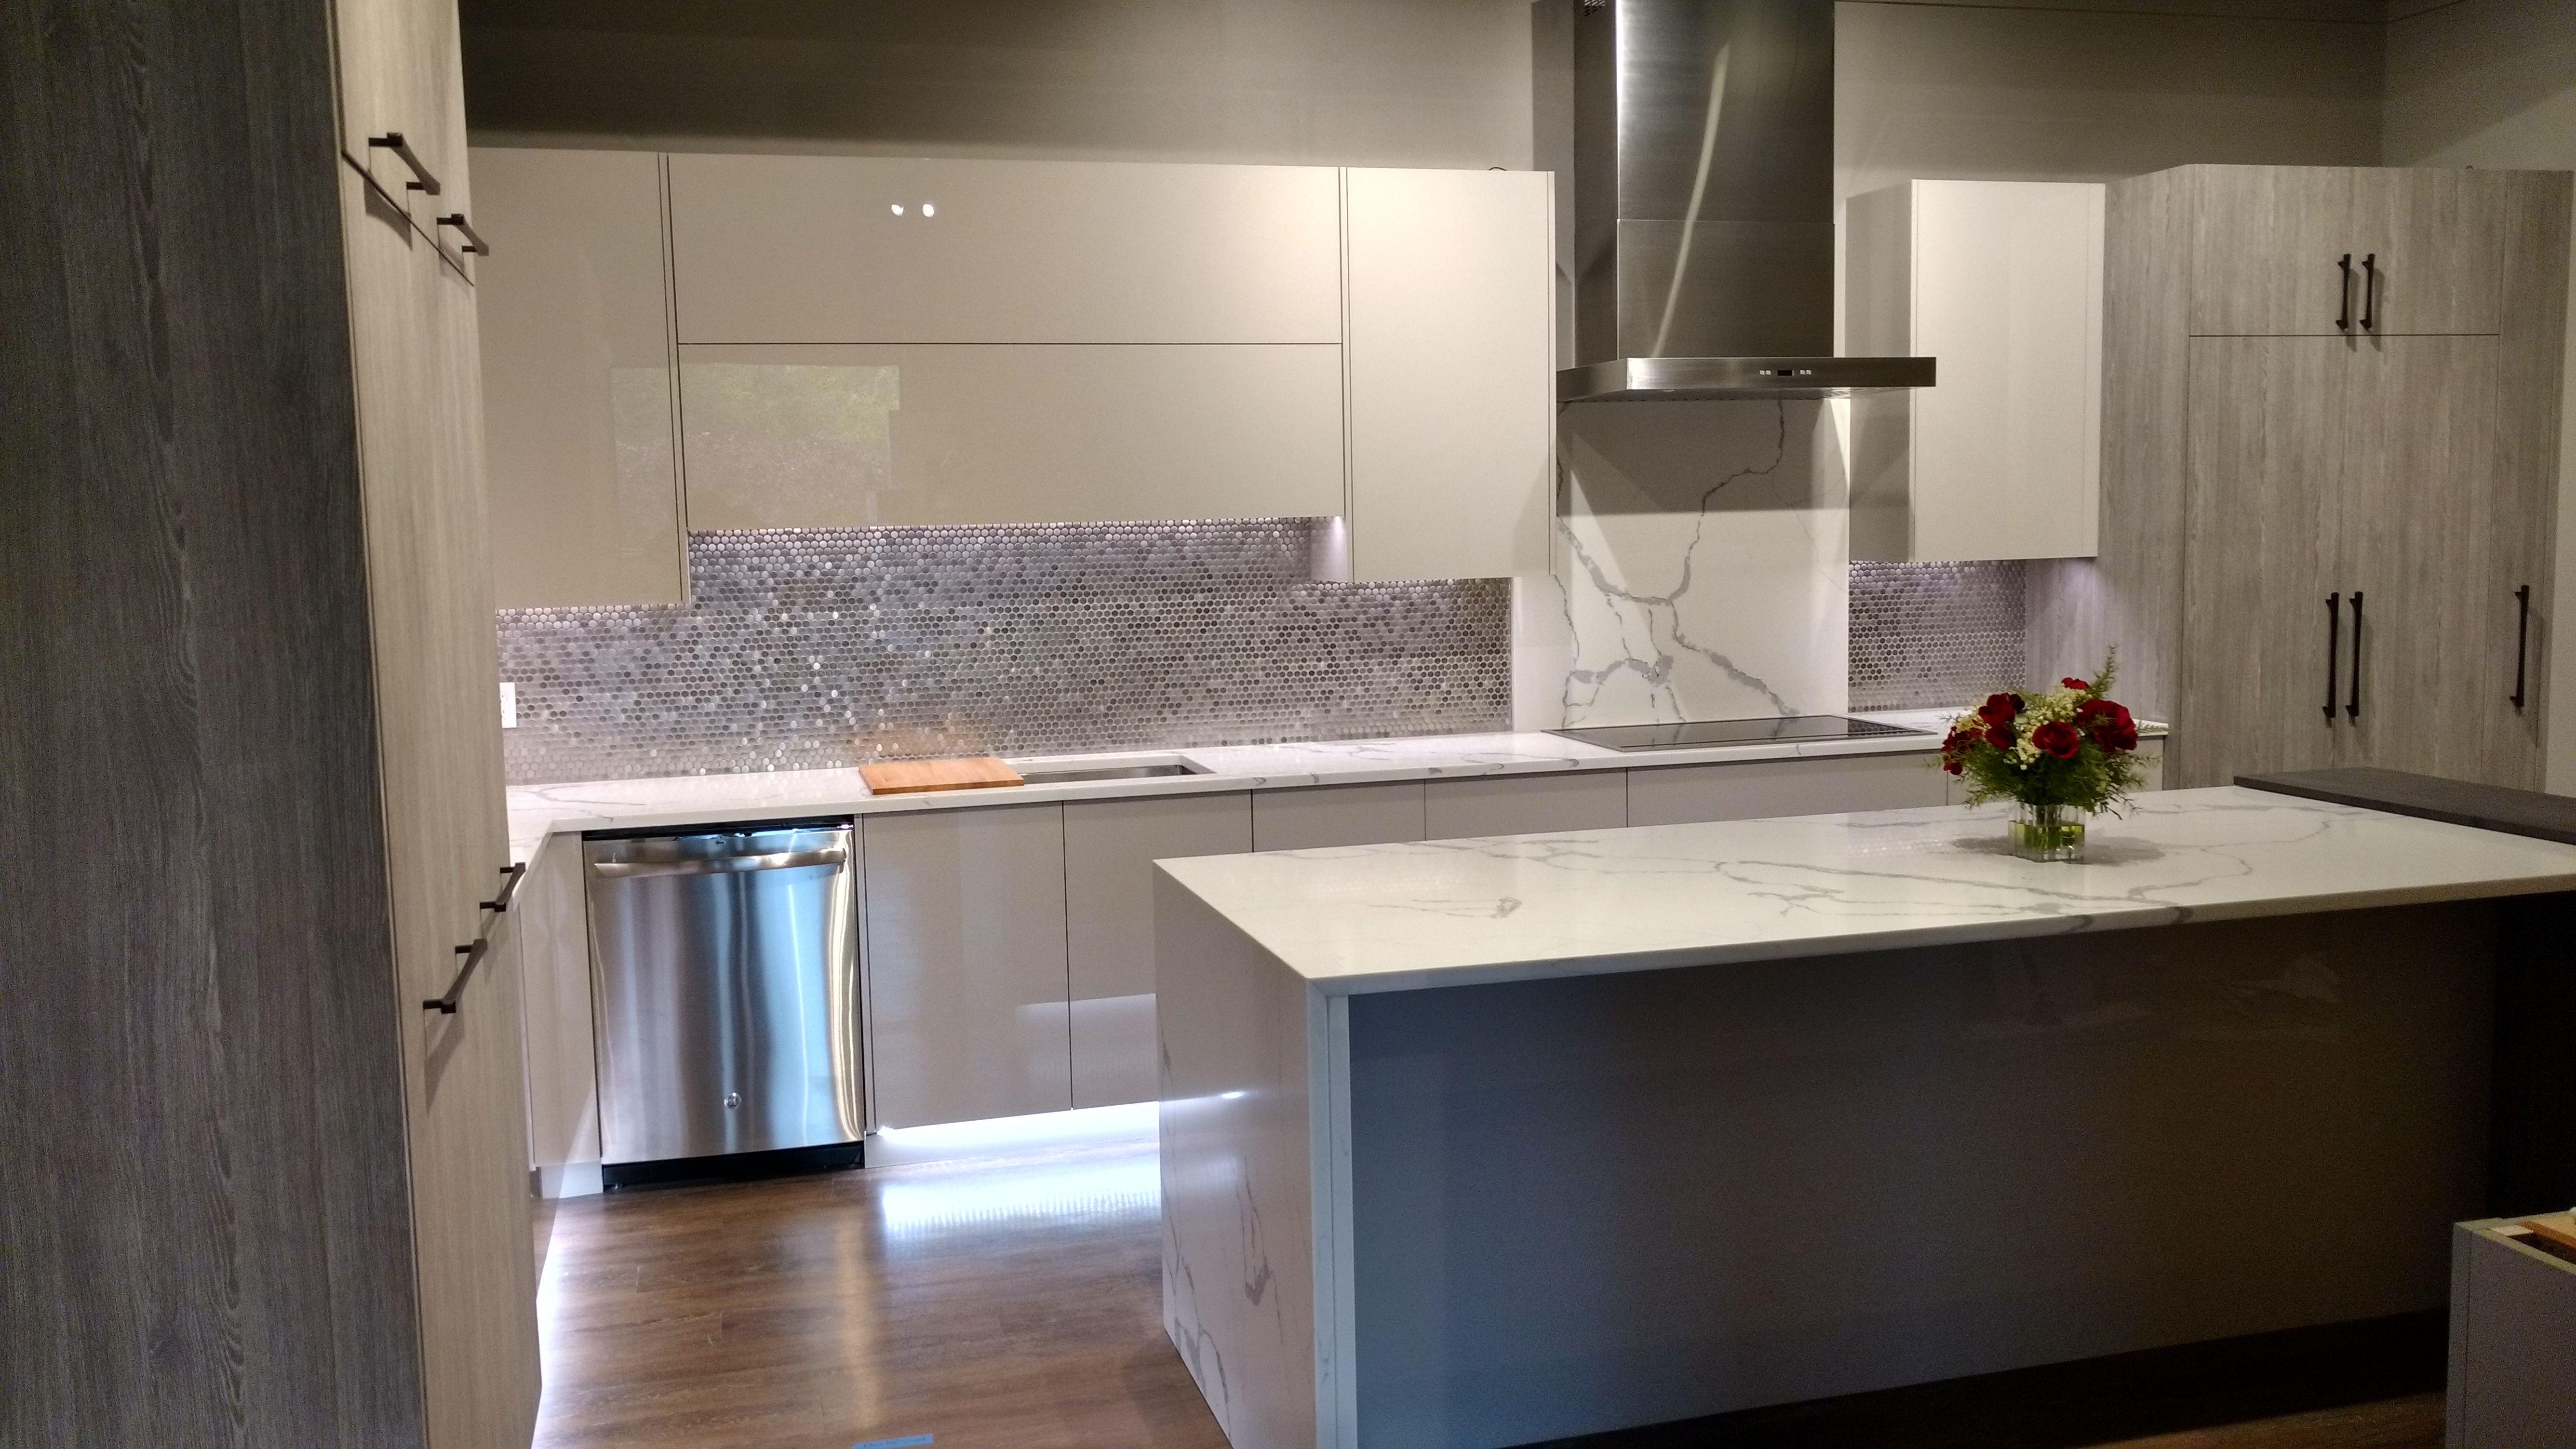 Modern Kitchen With Innovative Storage Solutions Our Showroom Kitchen Cabinets Kitchen Bath Showroom Custom Kitchen Cabinets